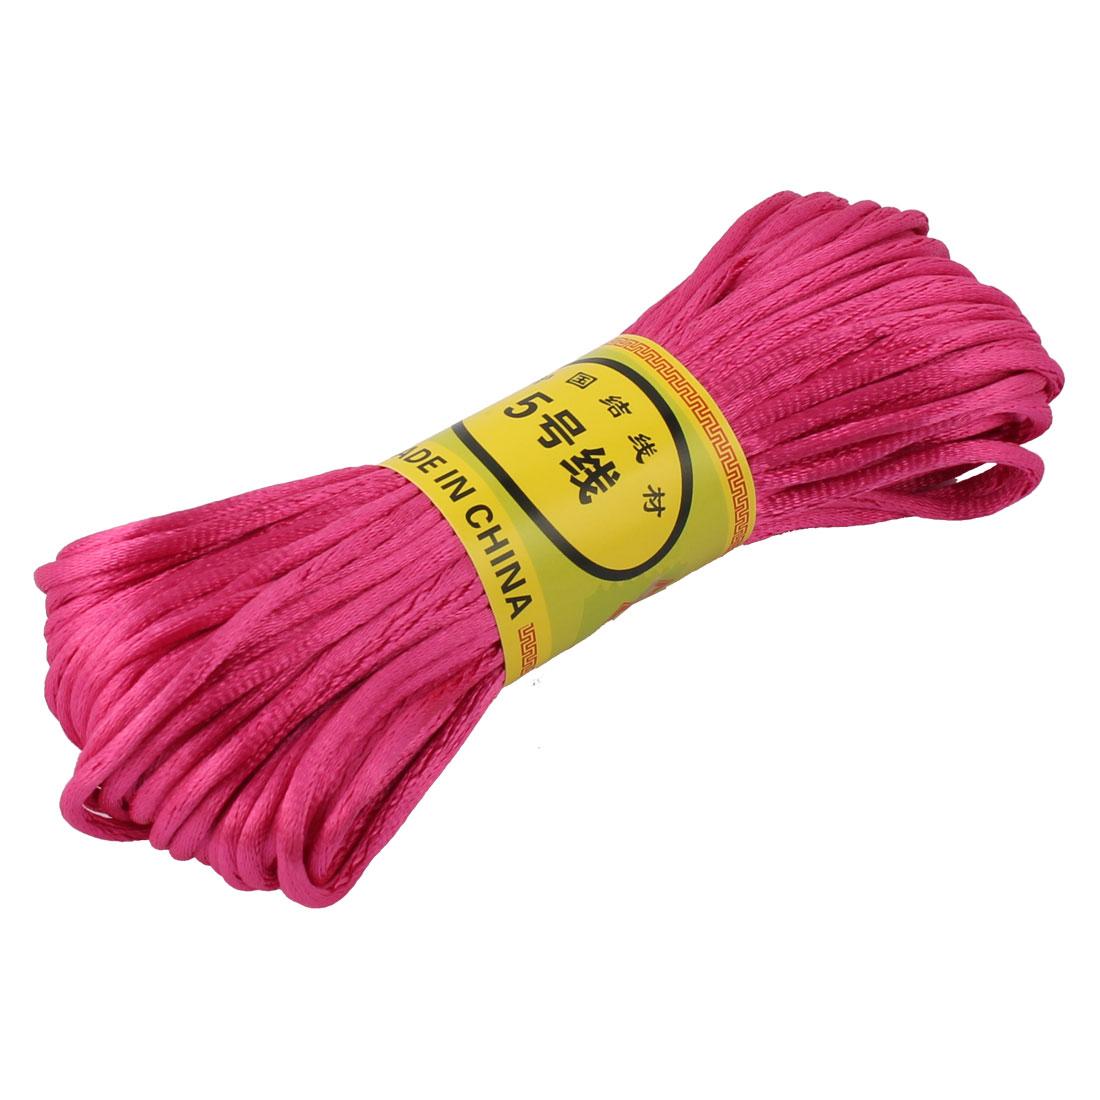 Fuchsia Nylon Cord Thread DIY Chinese Knot Macrame Rattail Bracelet Braided String 20M